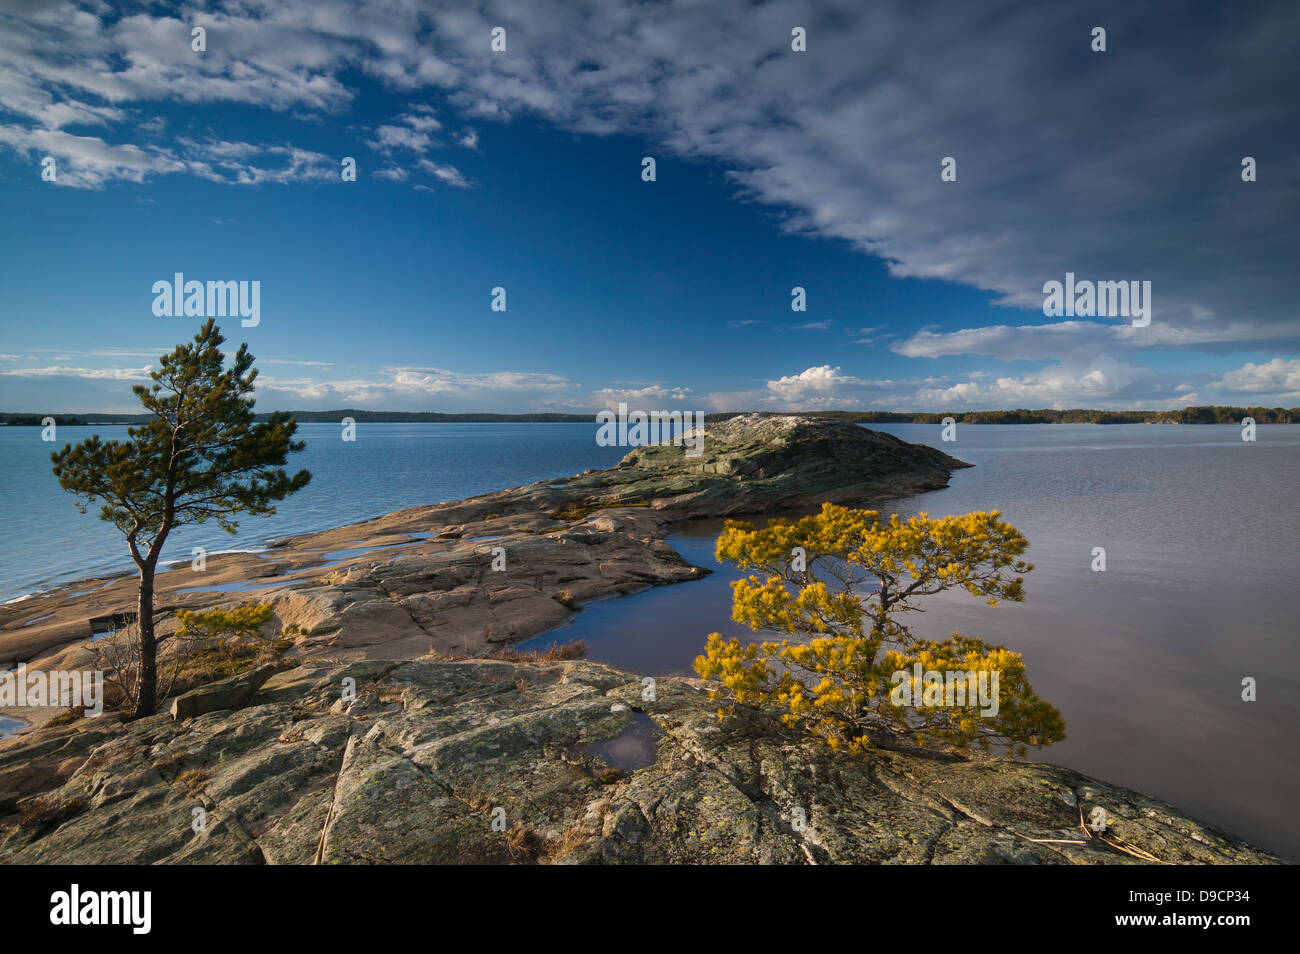 April abends auf der Insel im See Brattholmen Råde Vansjø, Kommune, Østfold fylke, Norwegen. Stockbild